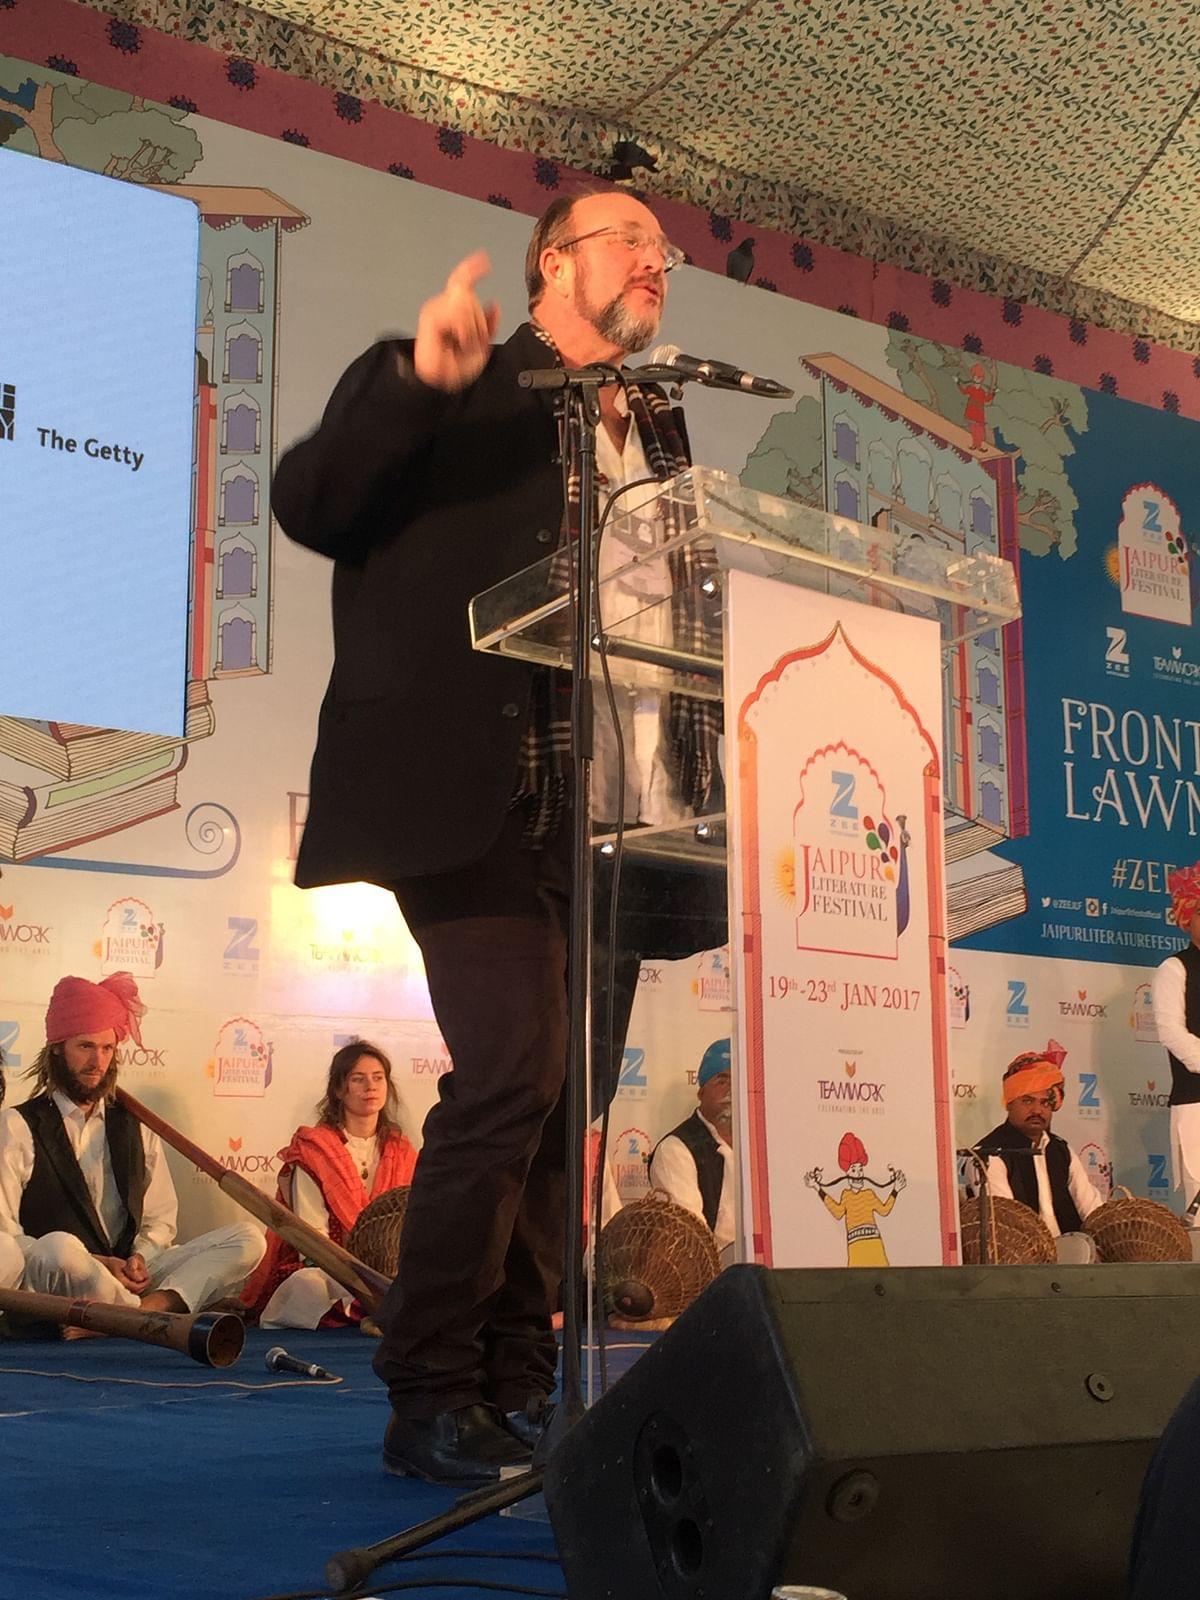 William Dalrymple delivering his keynote address. (Photo: Urmi Bhattacheryya/The Quint)